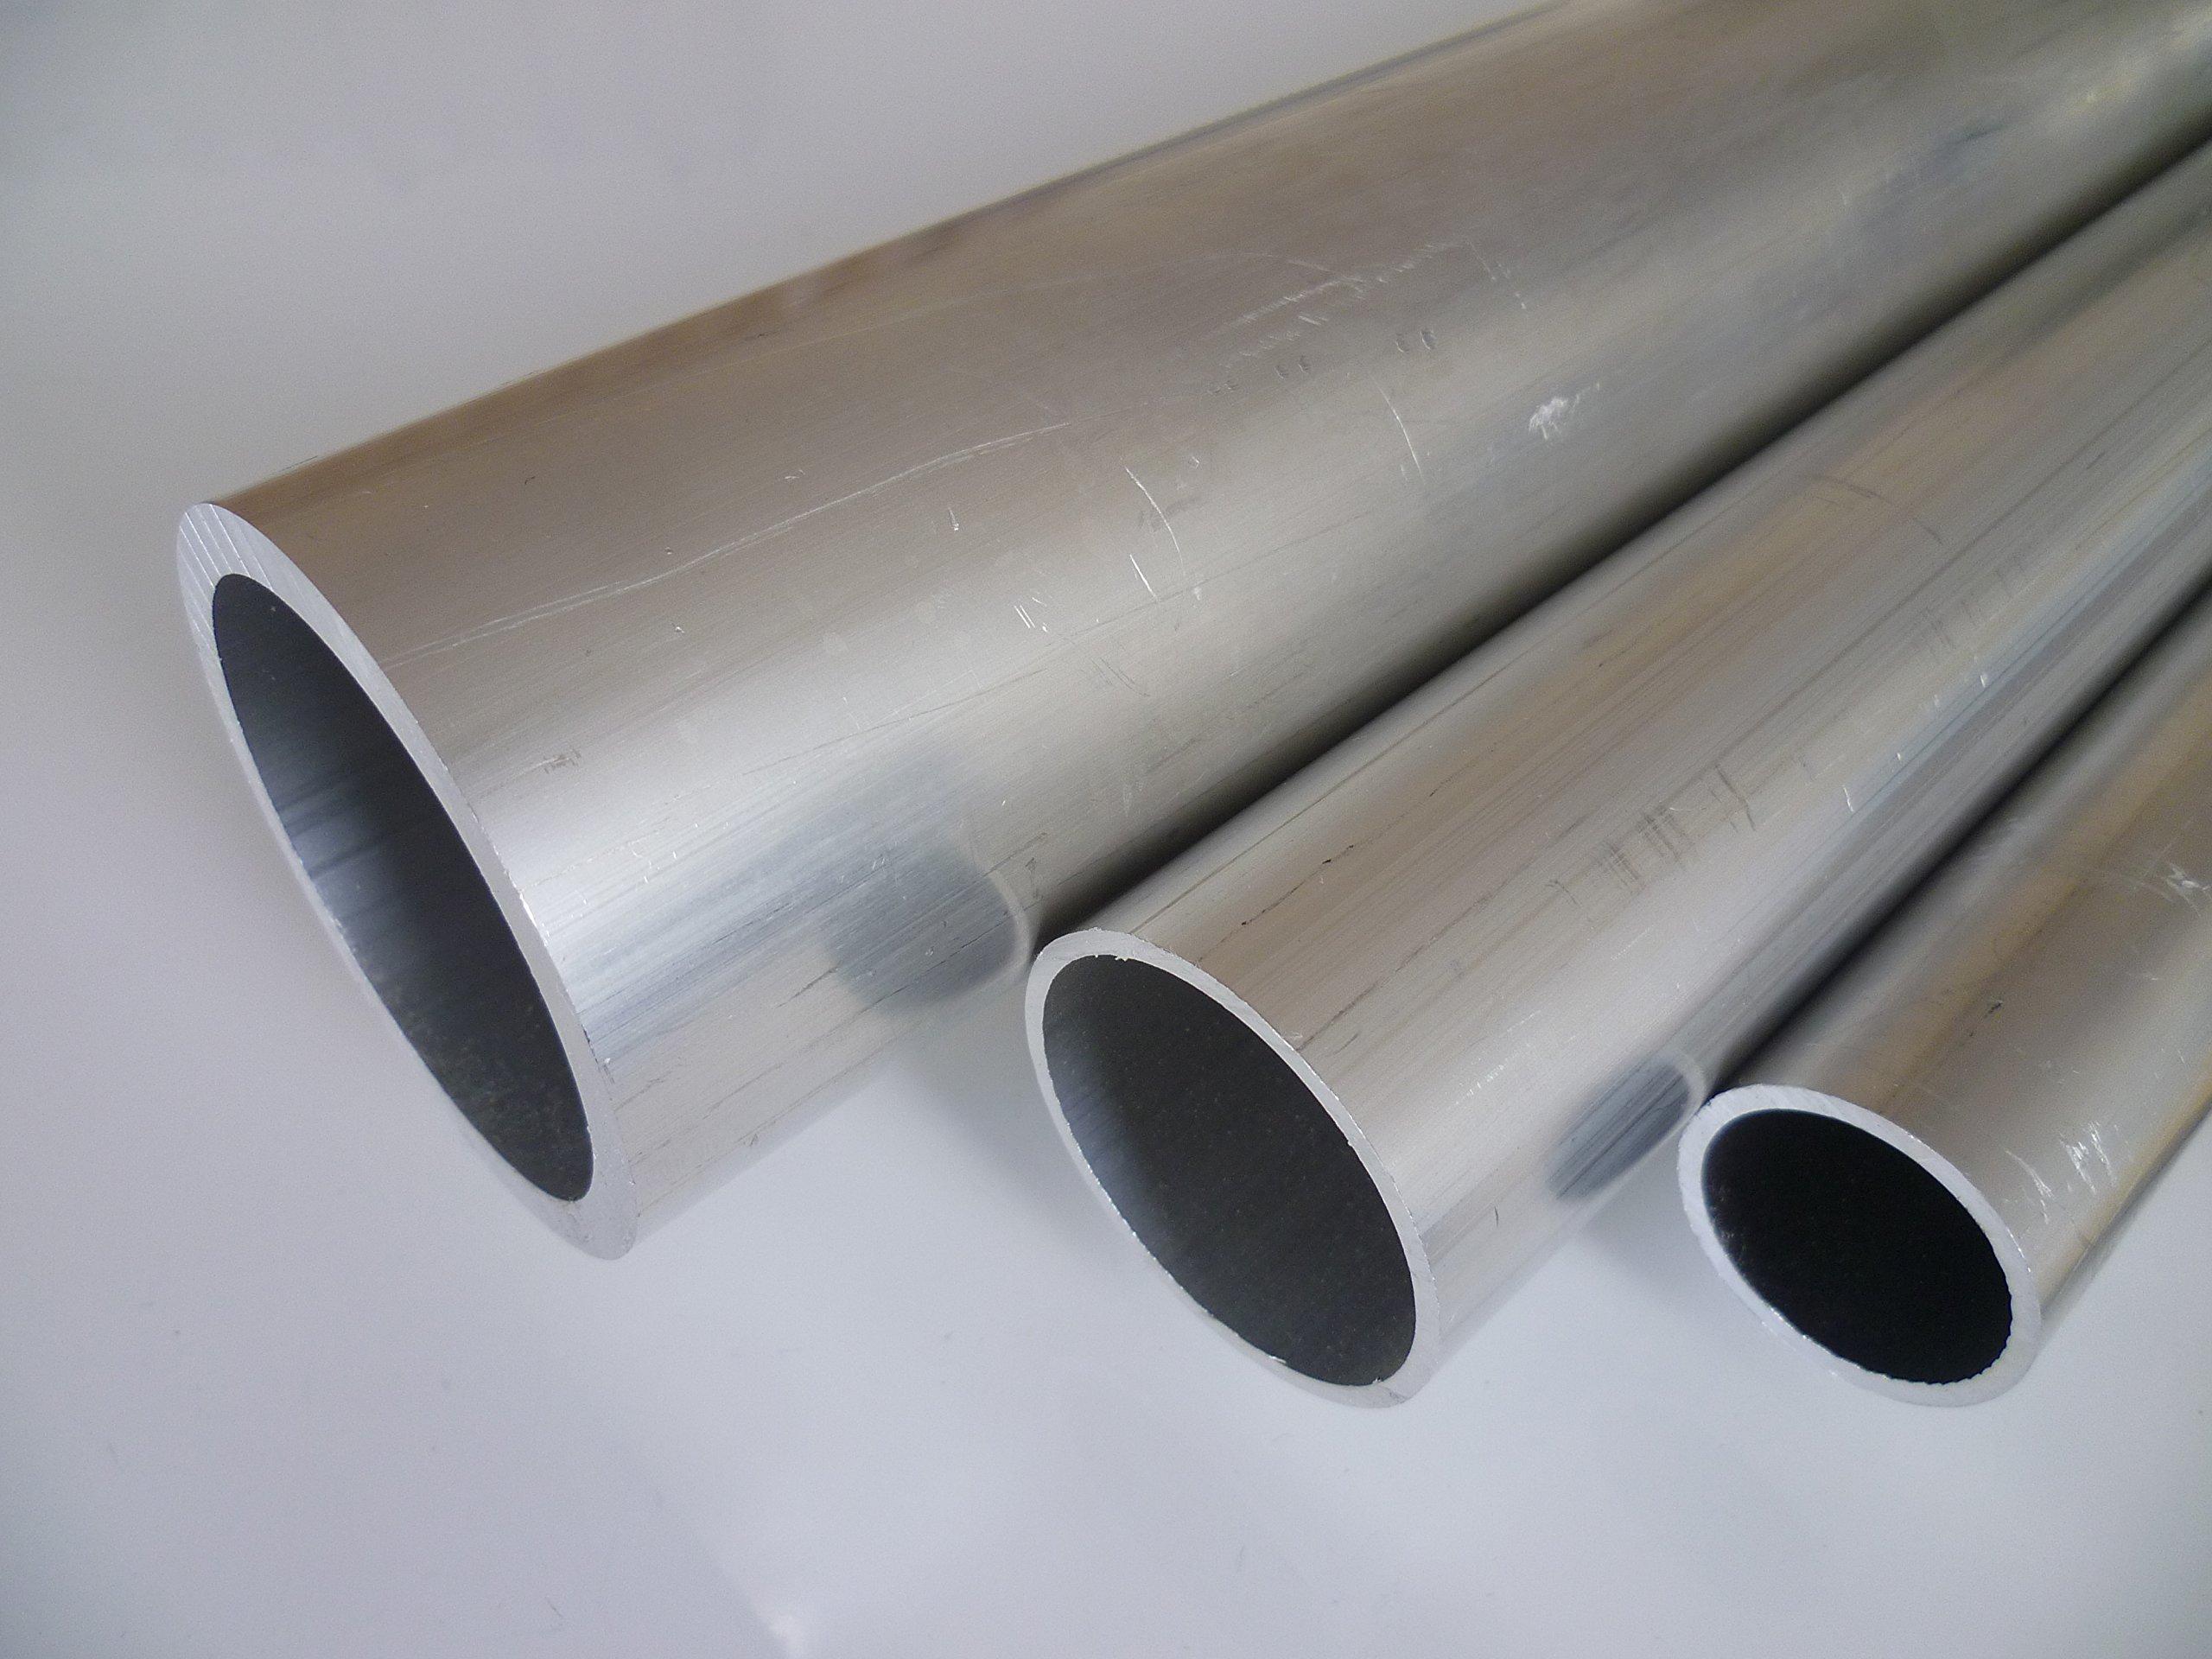 B/&T Metall Aluminium Vierkantrohr pulverbeschichtet 100 x 100 x 2 mm ANTHRAZIT RAL 7016 L/änge ca 1,9 mtr. 1900 mm +0//- 3 mm